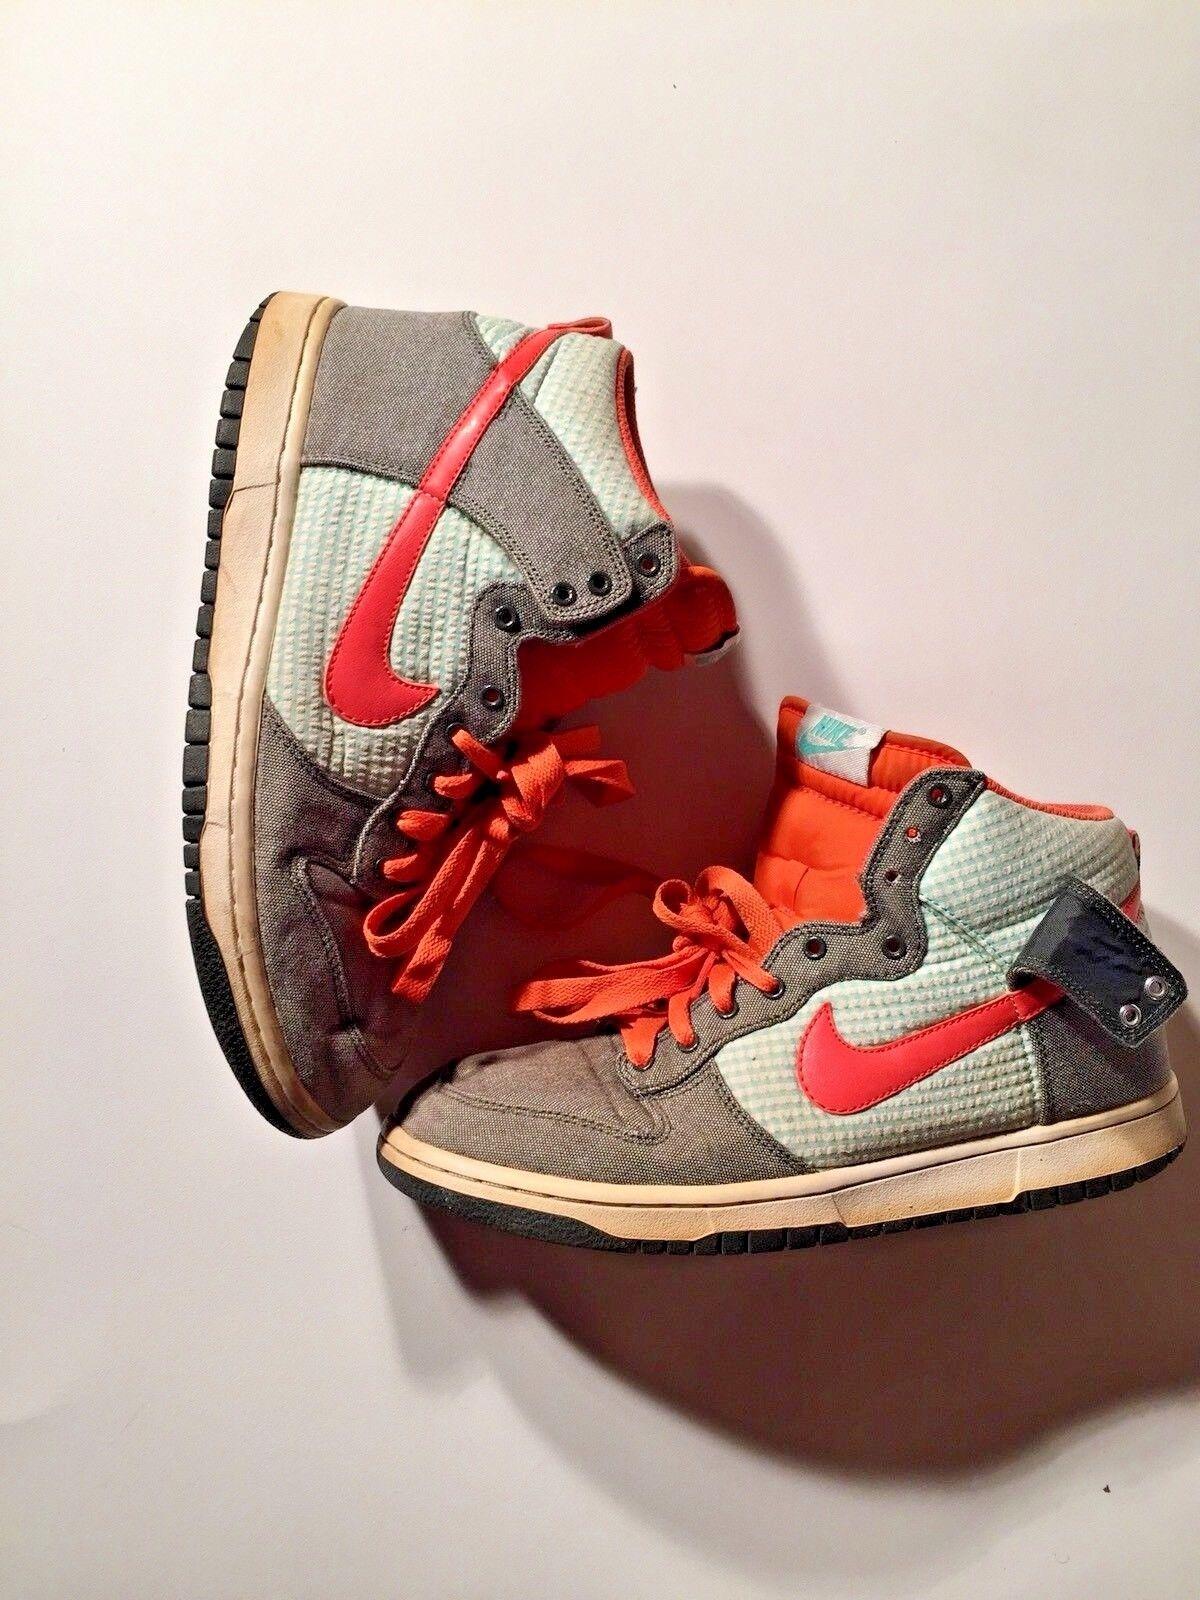 Men's Nike 009 Nike Men's Dunk High Top Dark Army Orange Blaze Mint SB Sz 9 344648-300 S53 8fa1eb